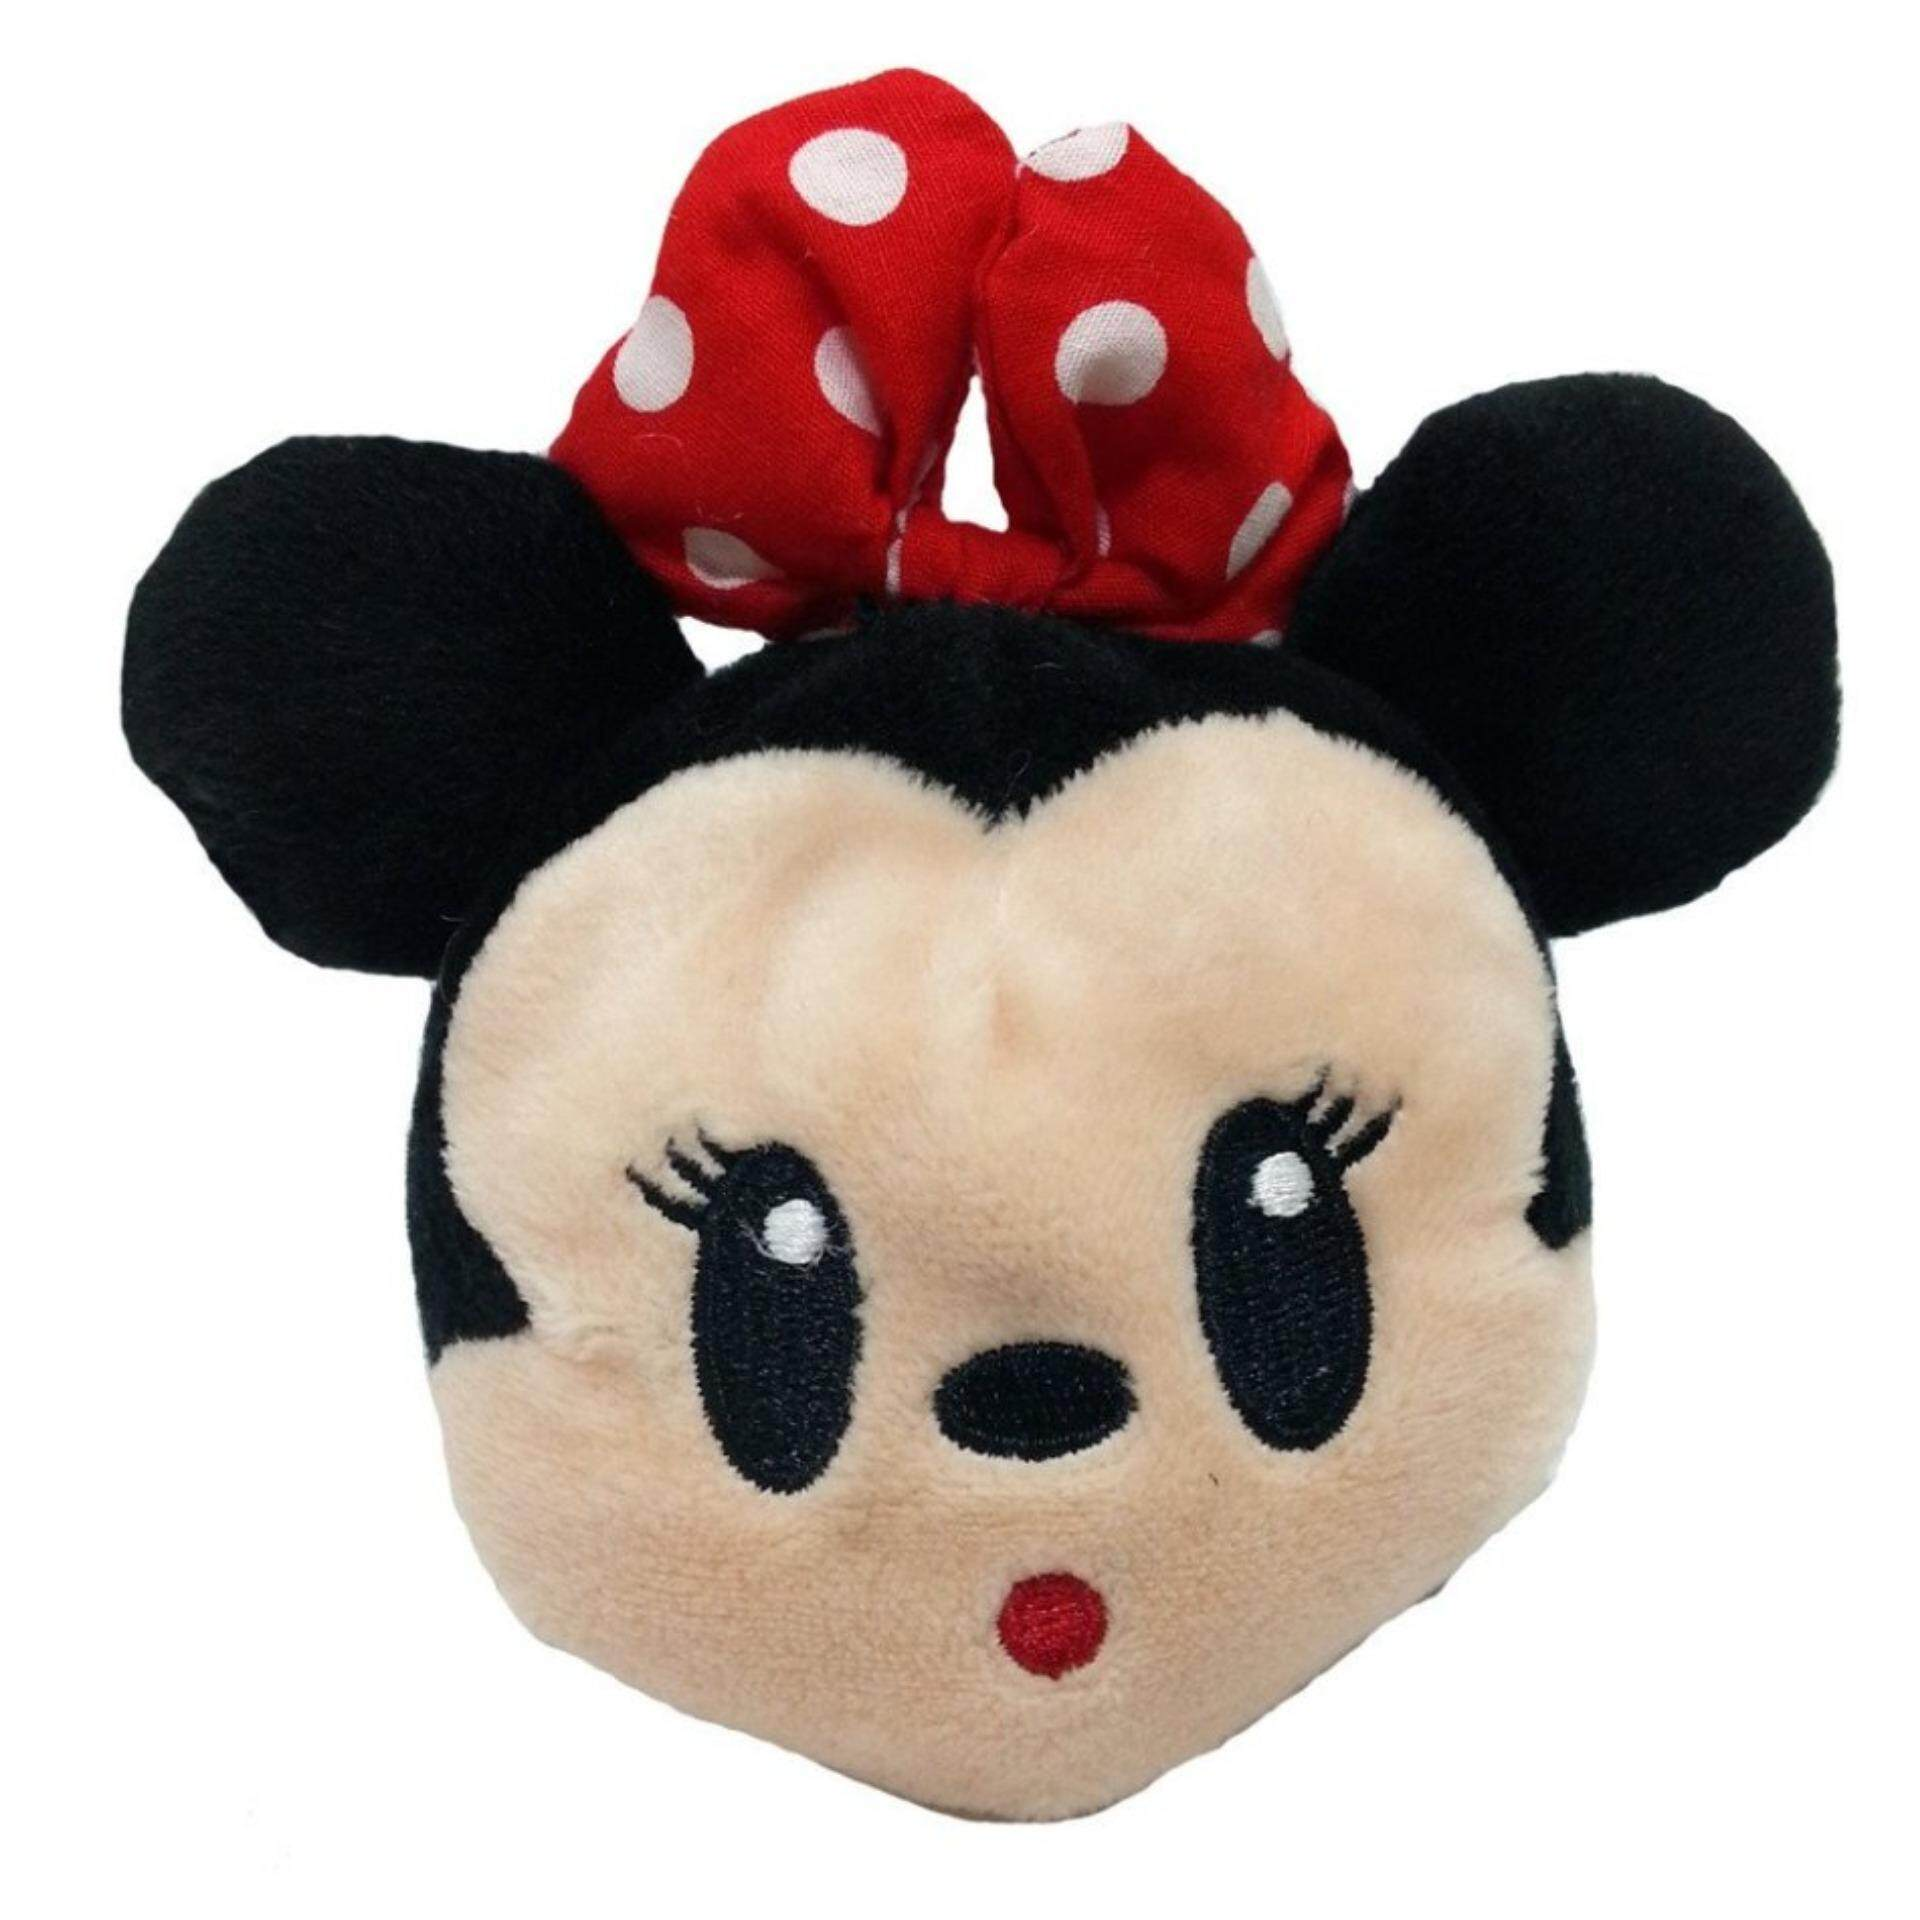 Disney Emoji Beanbags 2.5 Inches - Minnie O toys for girls